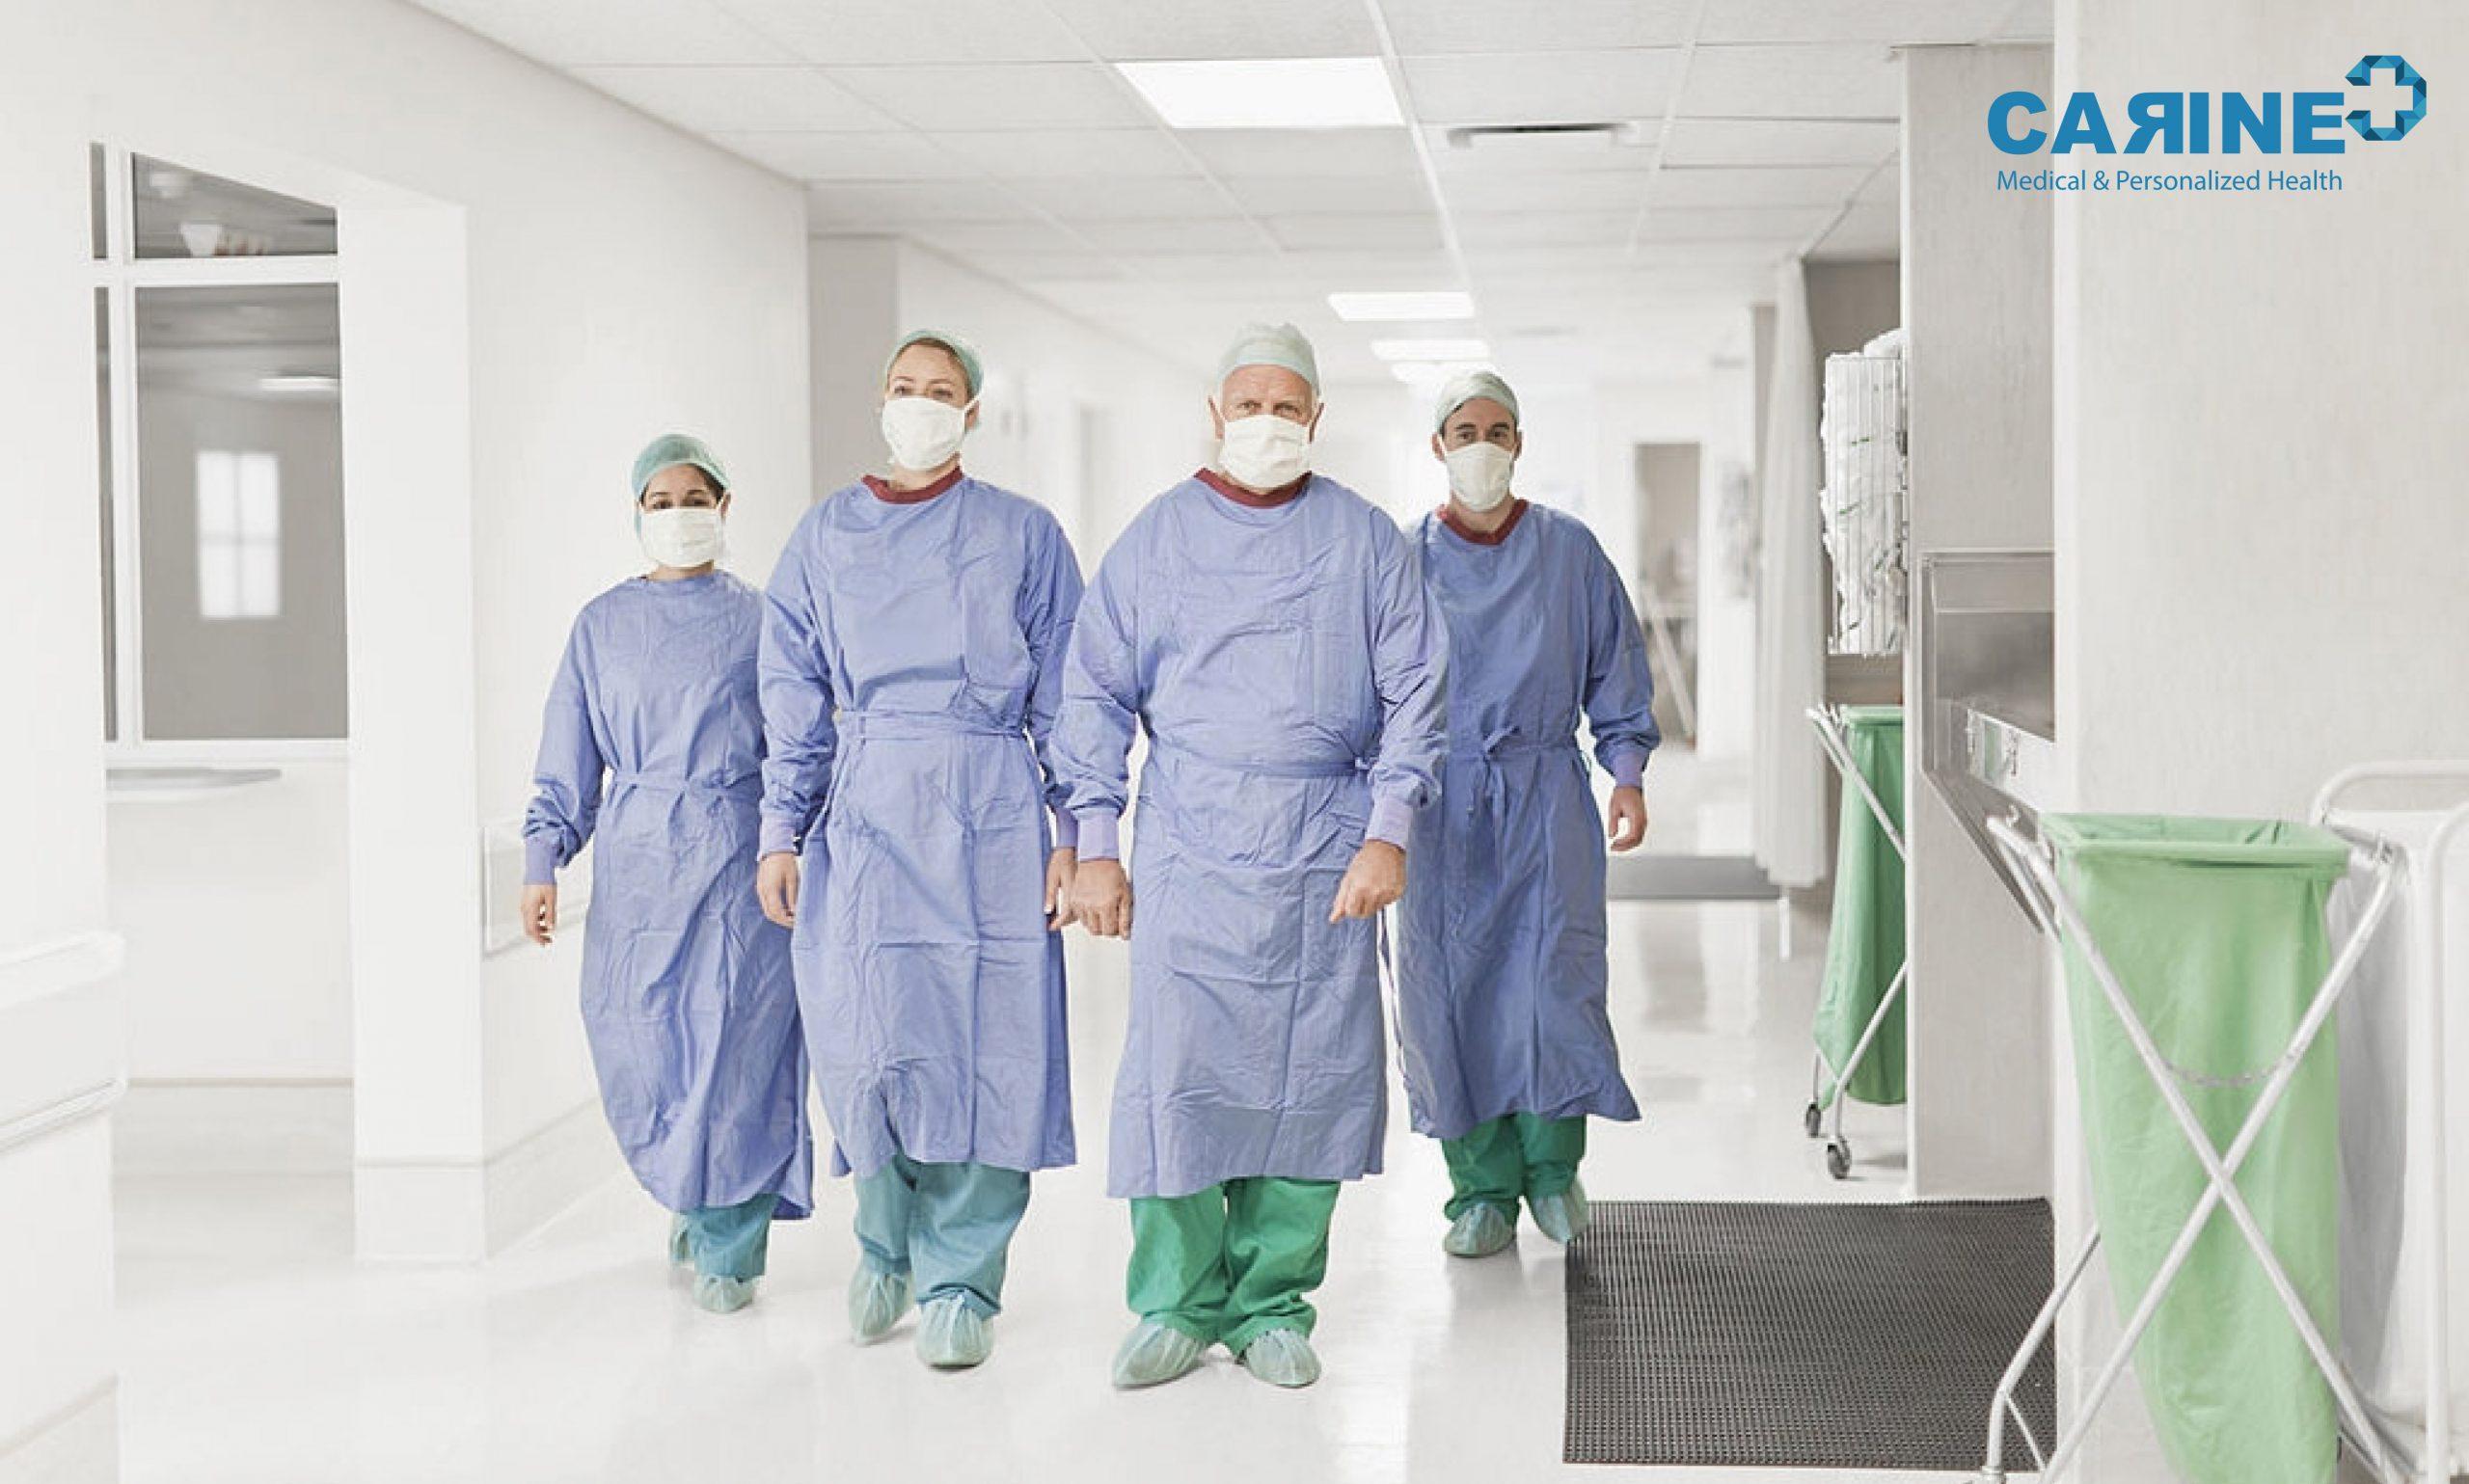 CARINE MEDICAL - COVID-19